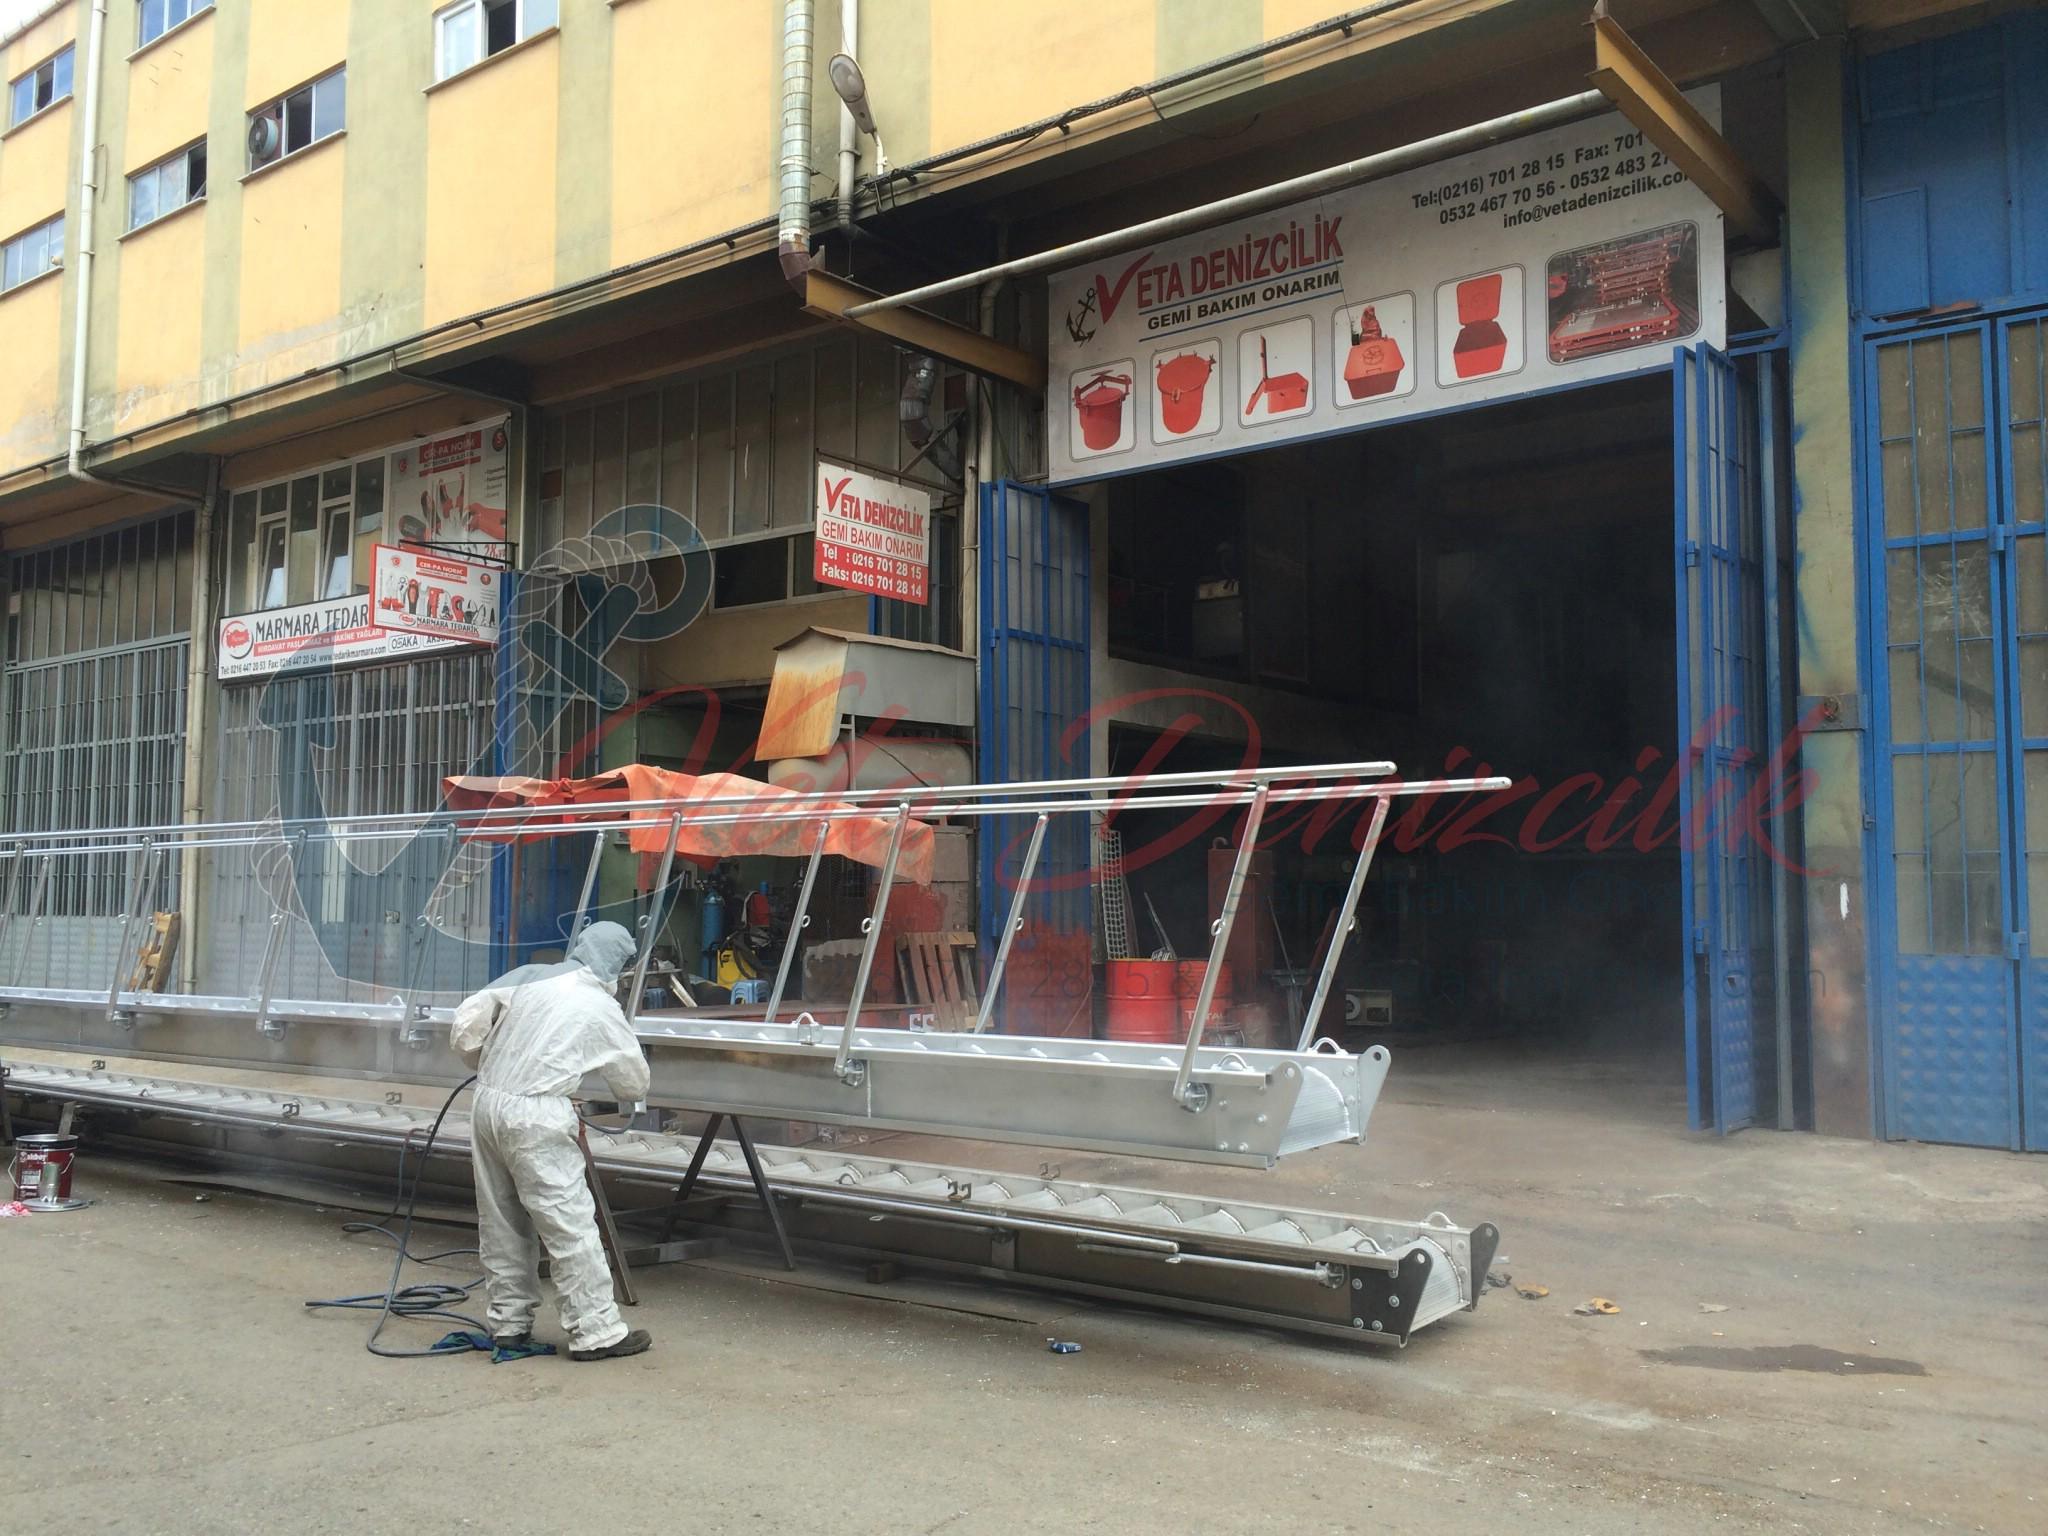 surme-iskele-aluminum-gangway-pilot-ladder-35.jpg